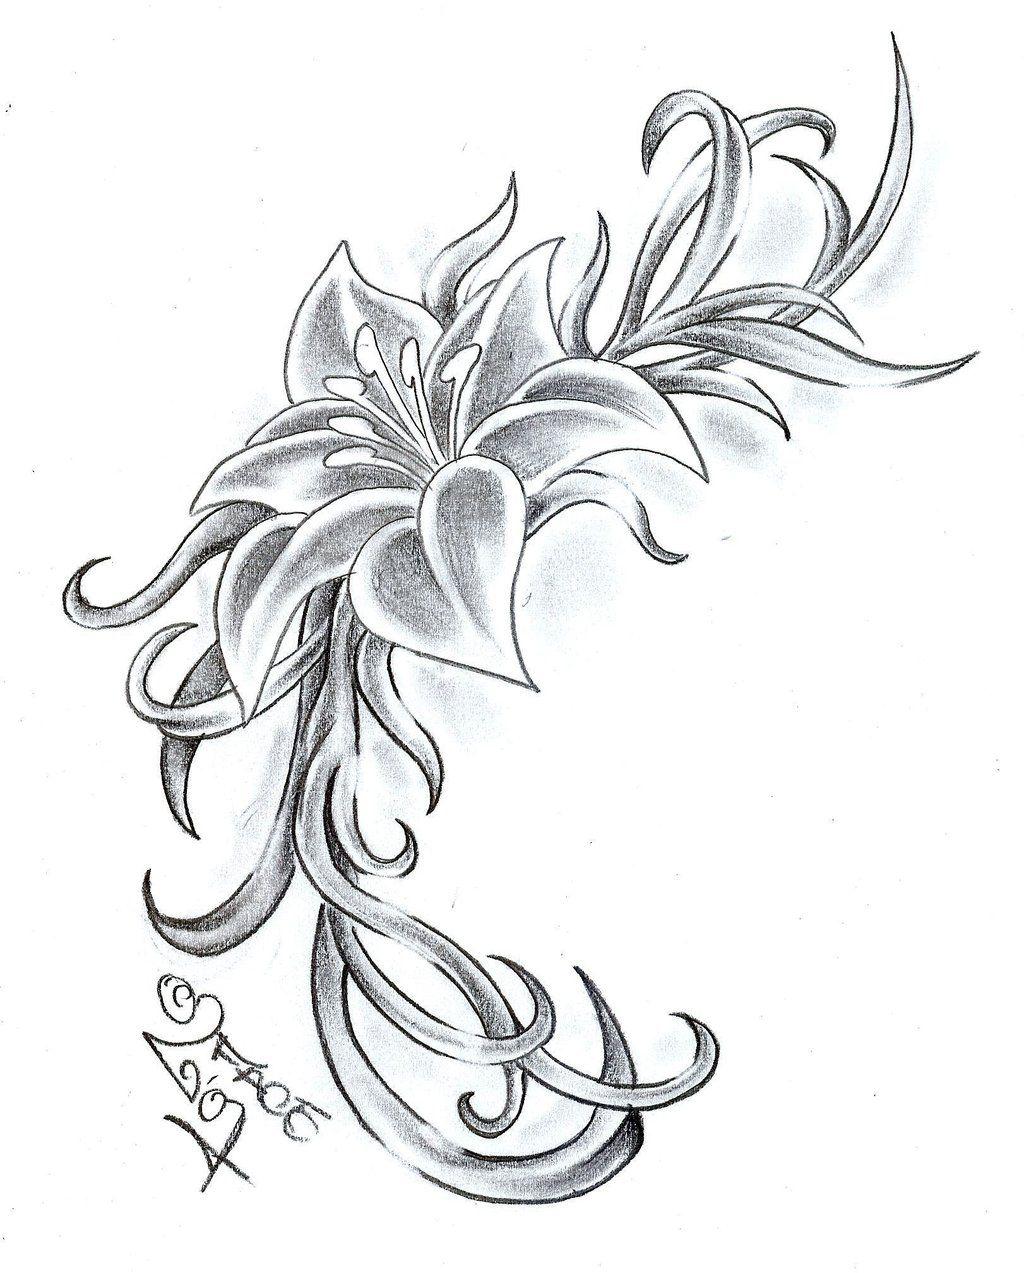 Flower_Climb_Tattoo_Design_by_2Face_Tattoo